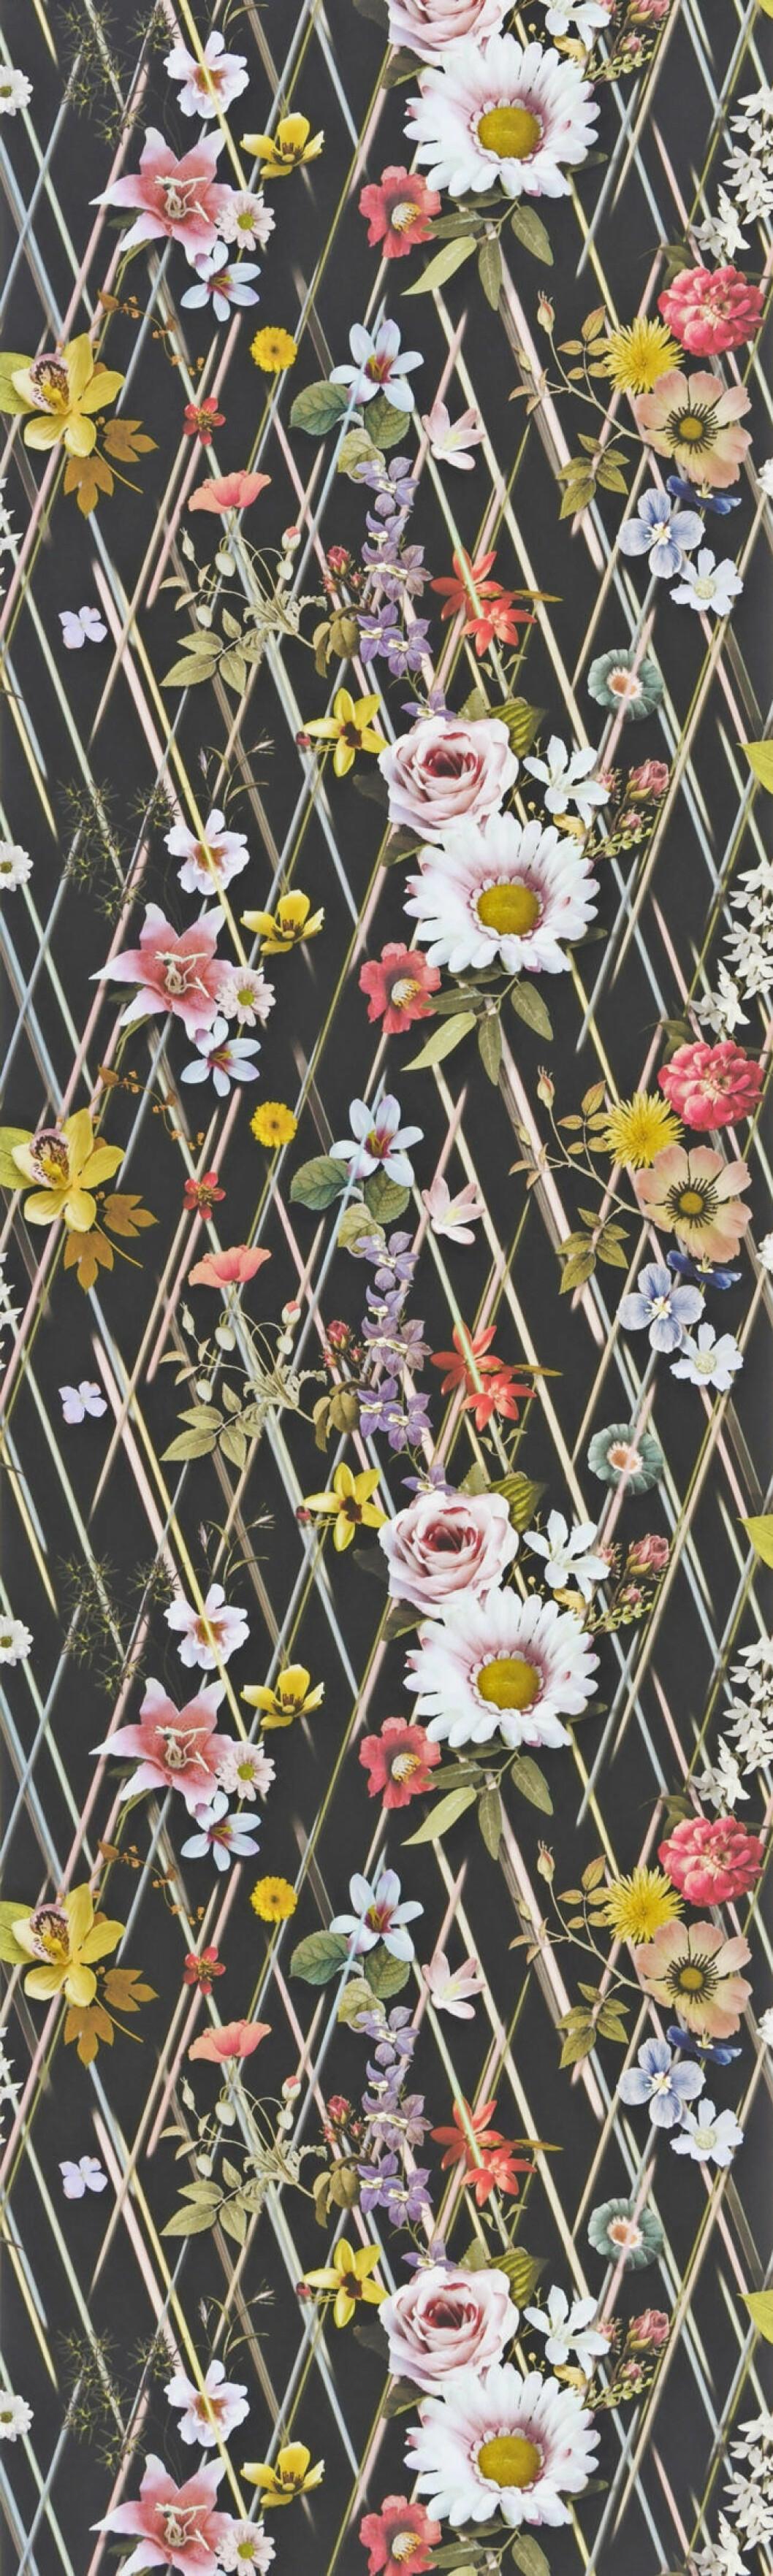 Den blommiga tapeten Rocaille mot svart bakgrund från Designers Guild